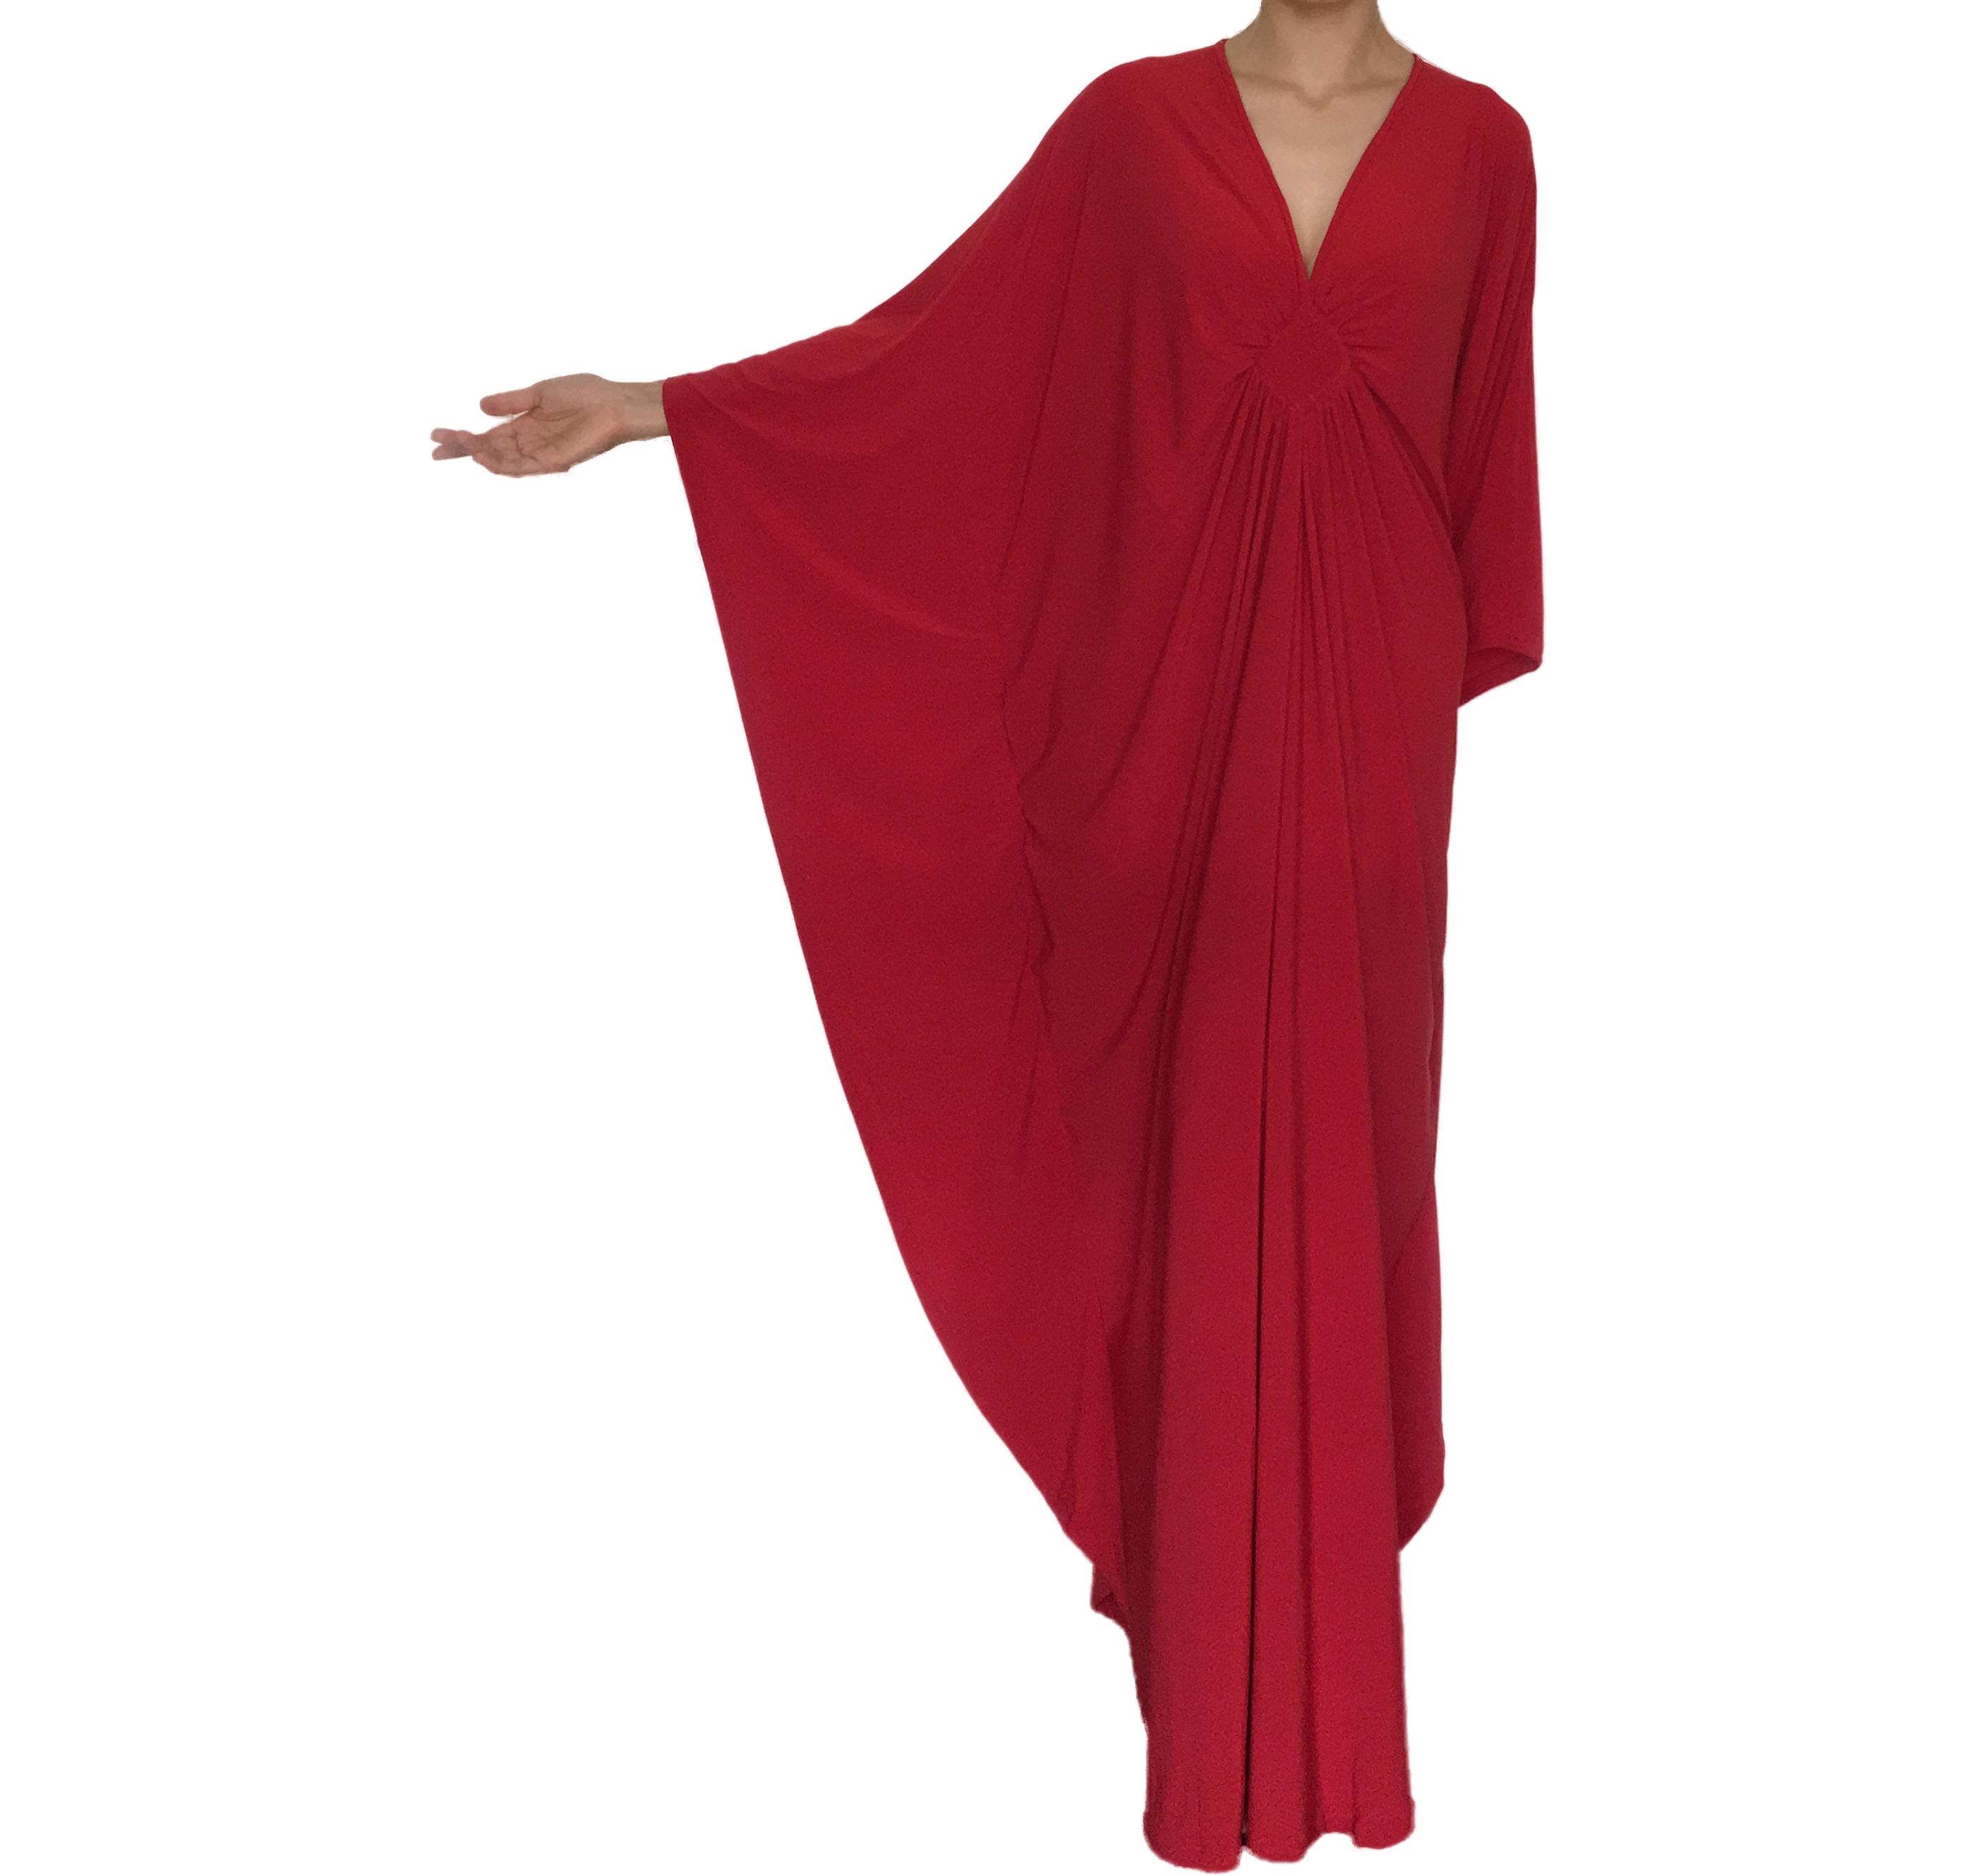 Bridesmaid Wedding Party Plus Size Maxi Kaftan Dresses Red on Storenvy